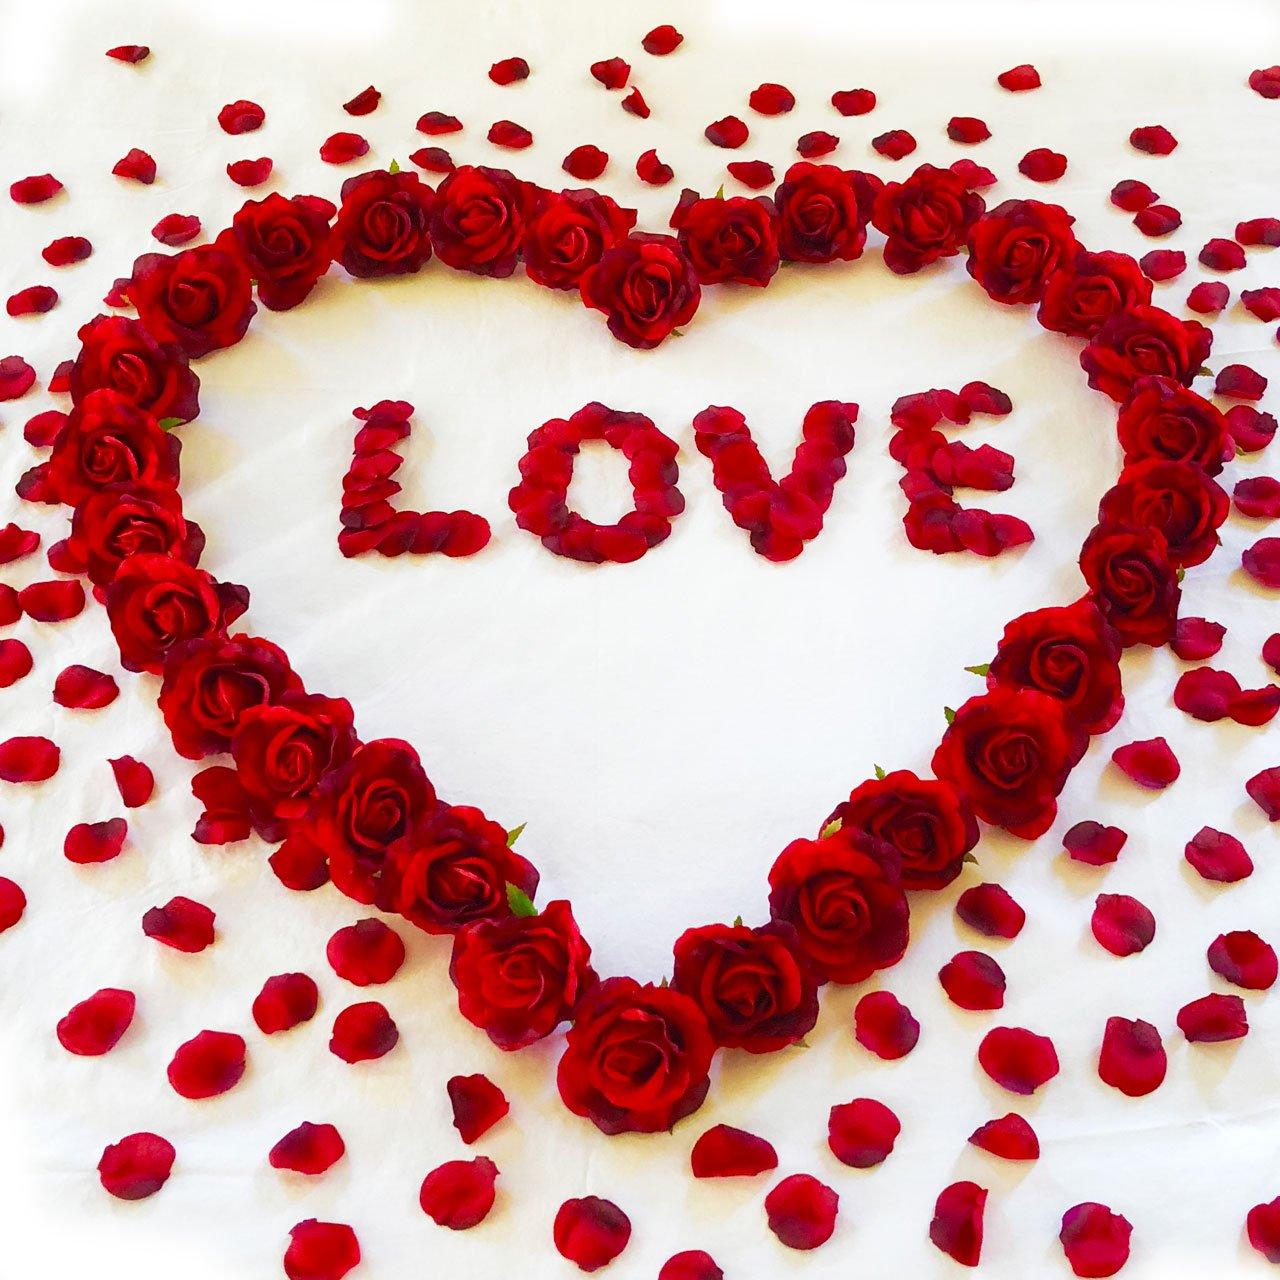 Amazoncom Red Roses Petals Love Anniversary Decorations